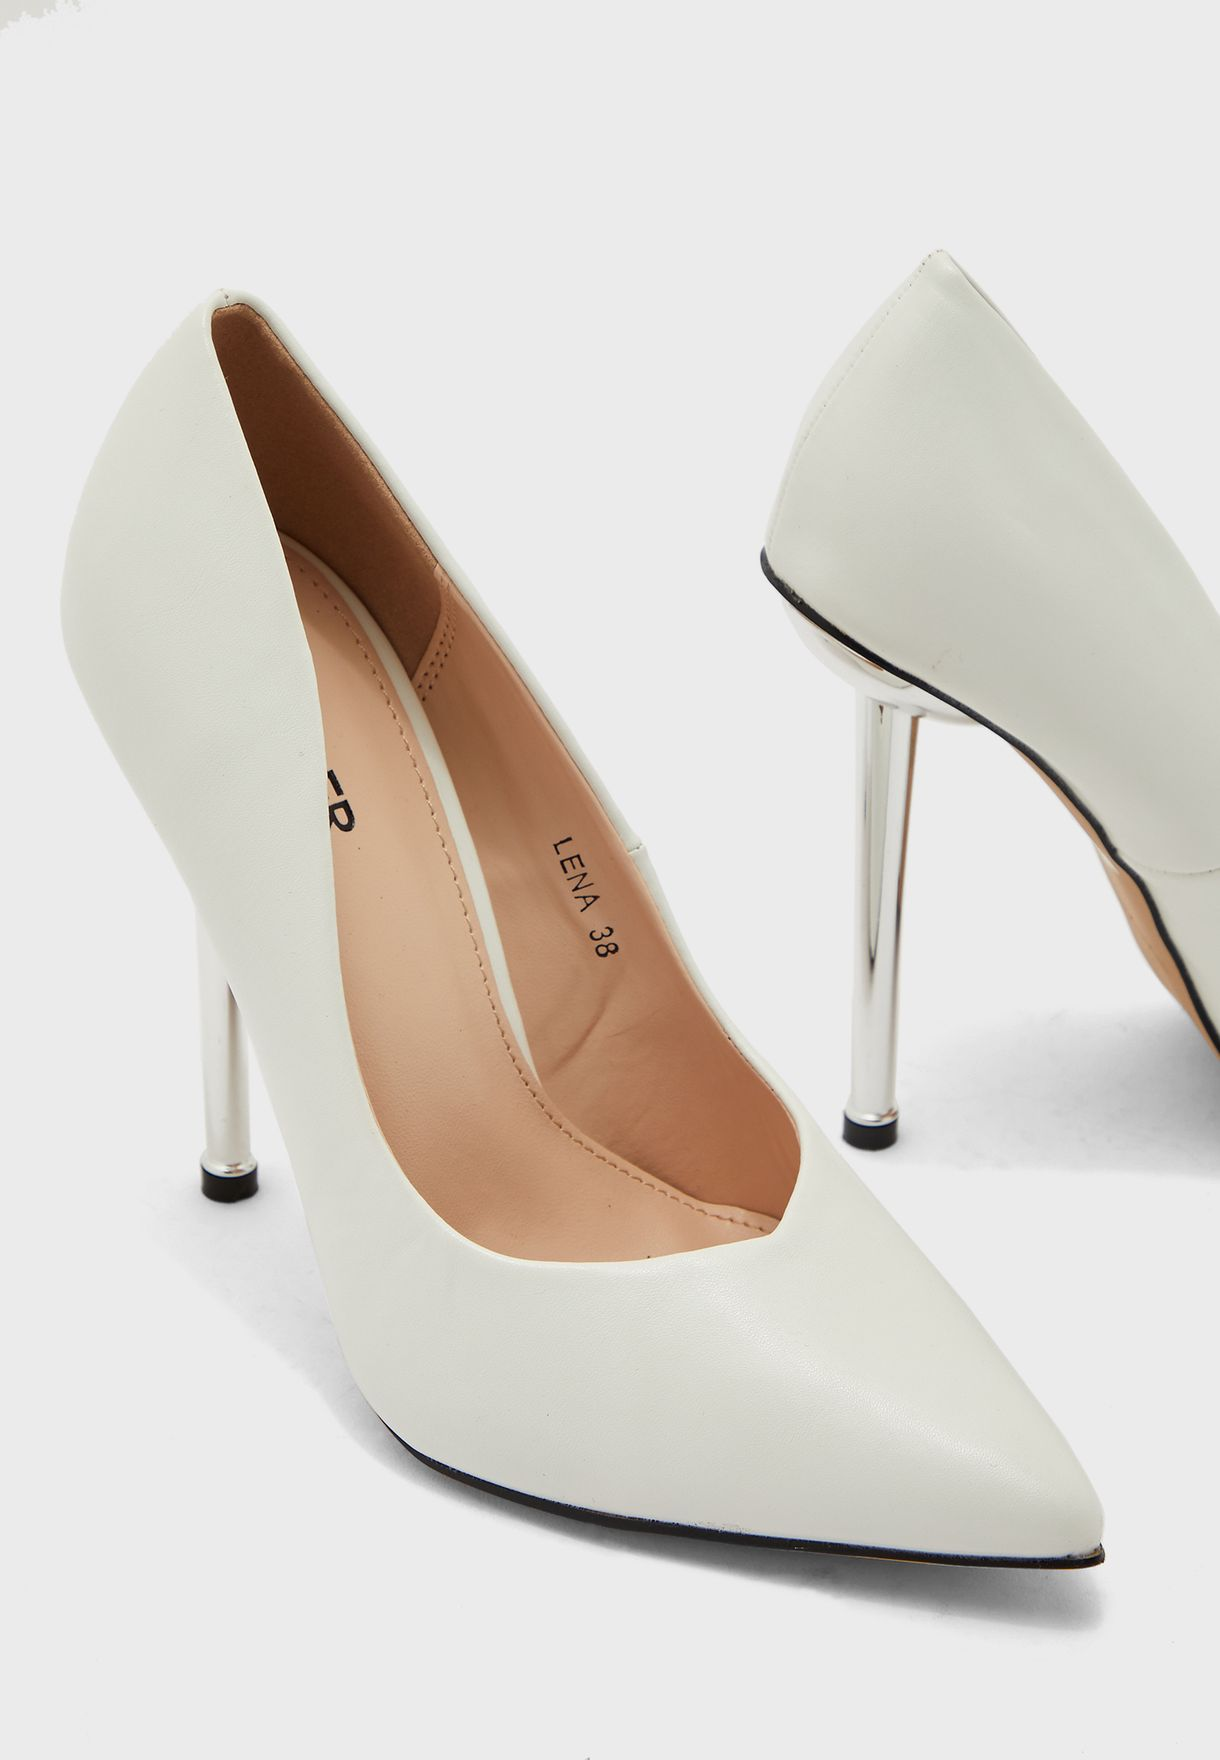 Pointed toe pump with metal heel